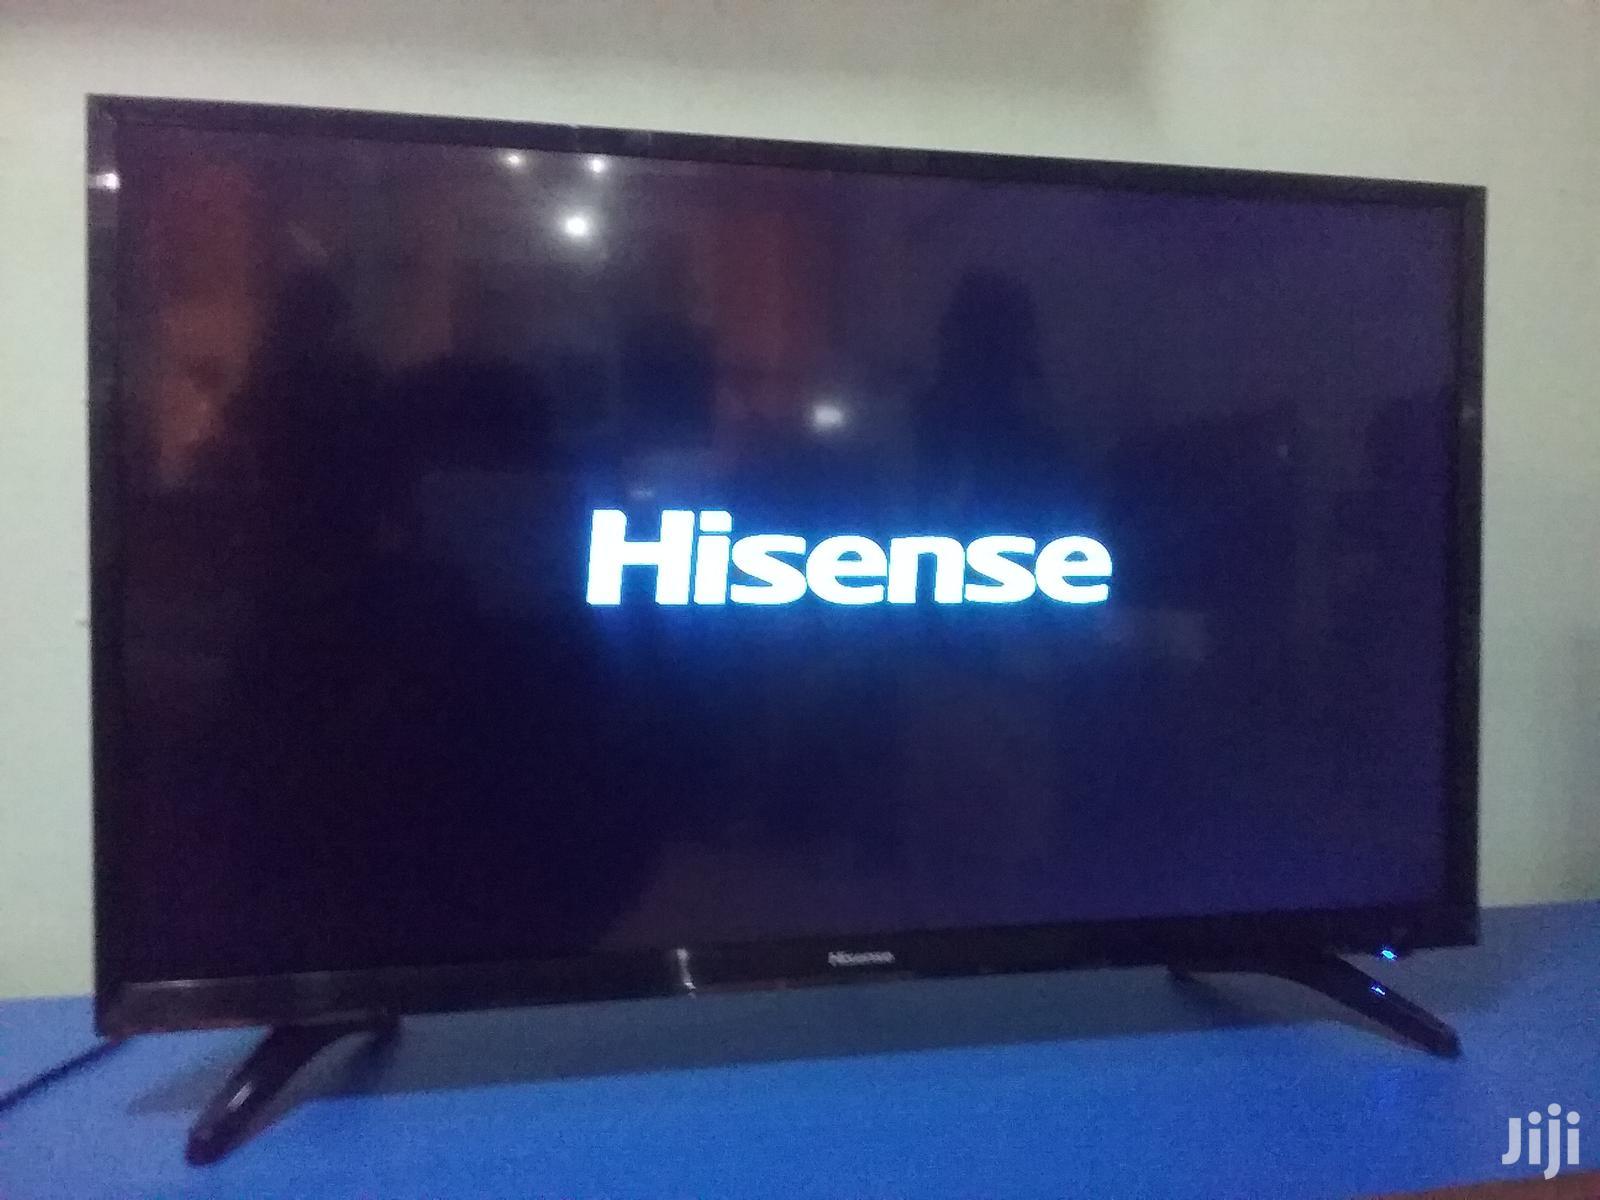 Archive: Brand New Hisense Flat Screen TV 32 Inches